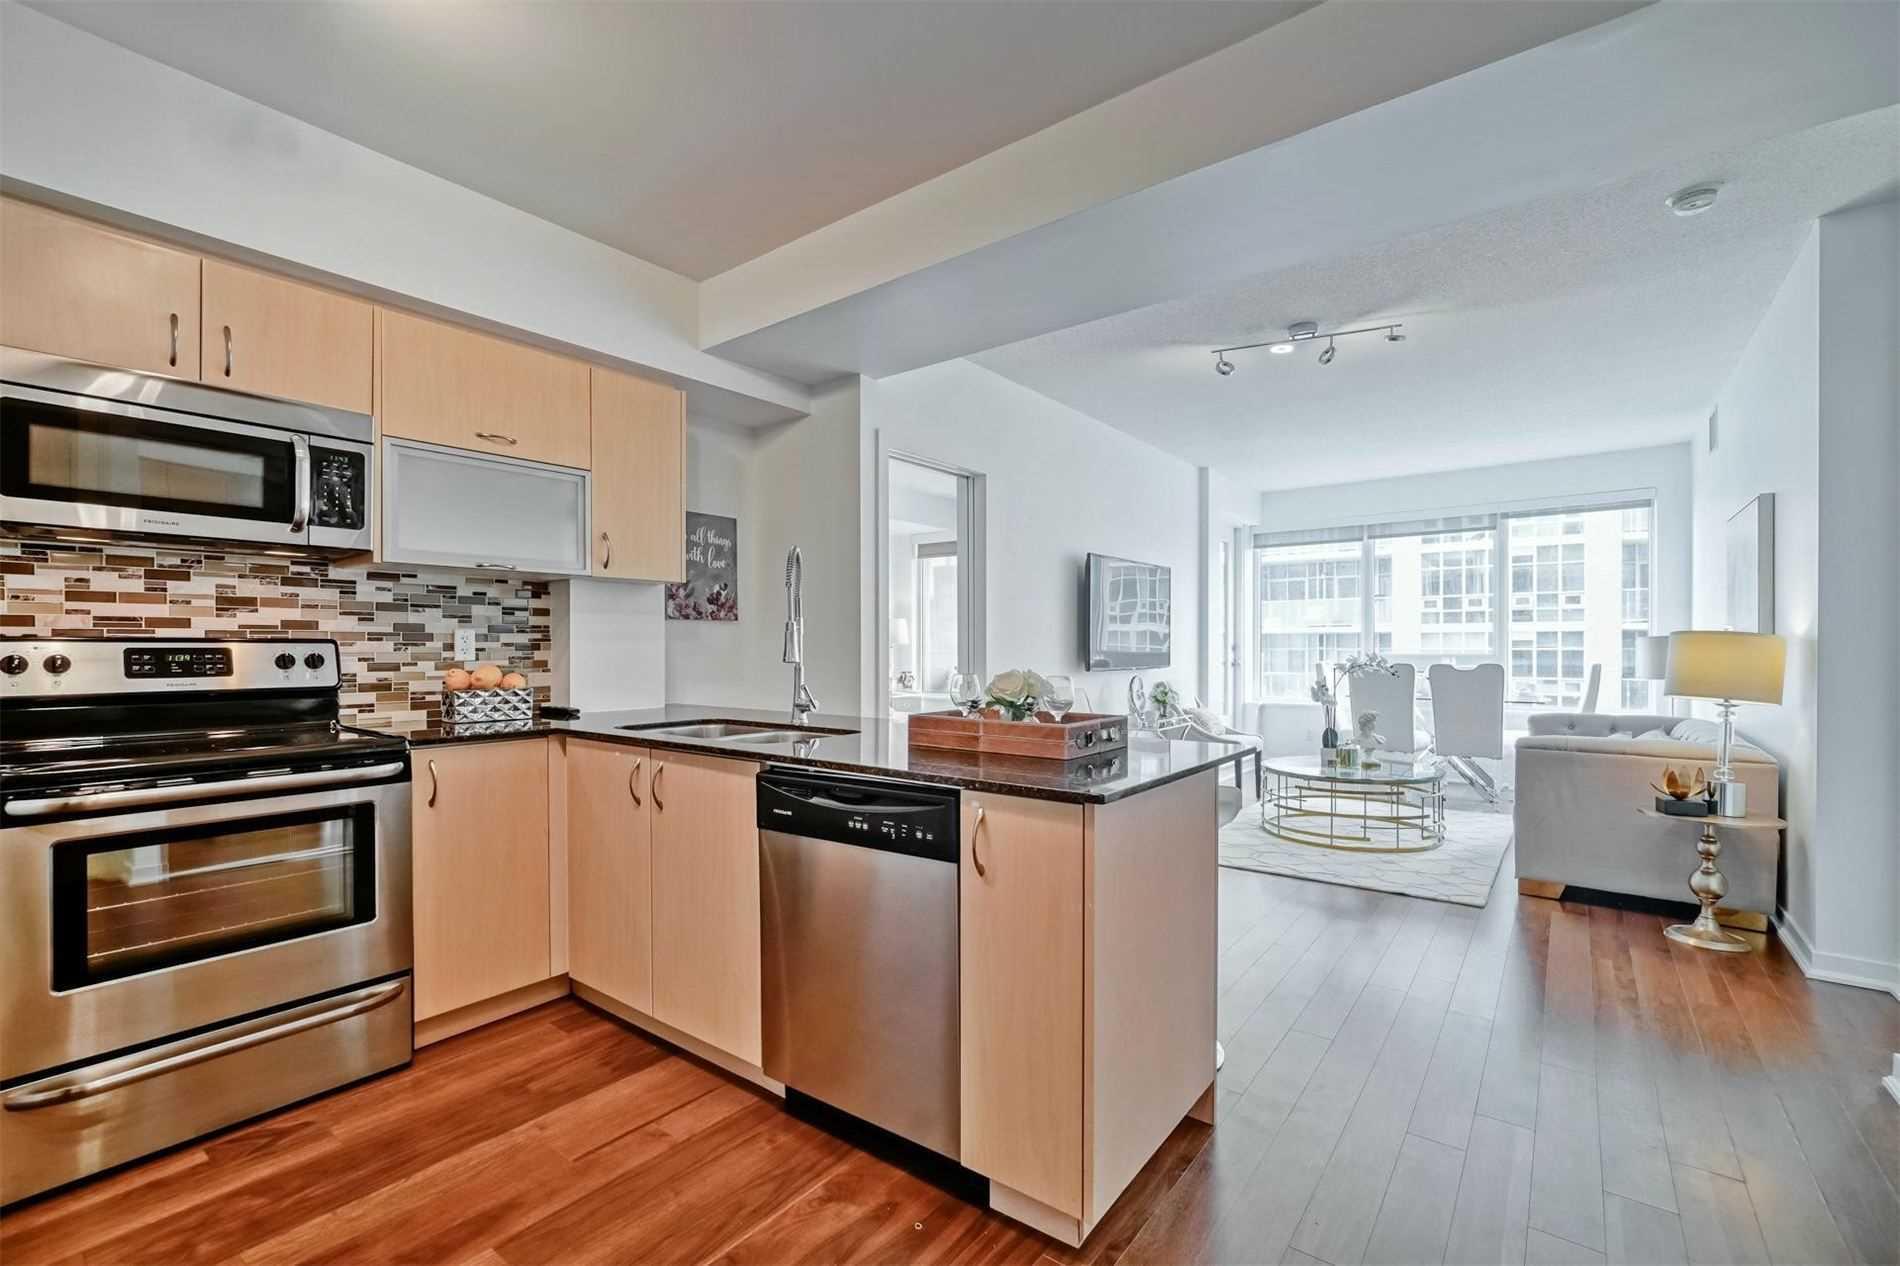 1606 - 59 East Liberty St, Toronto, M6K3R1